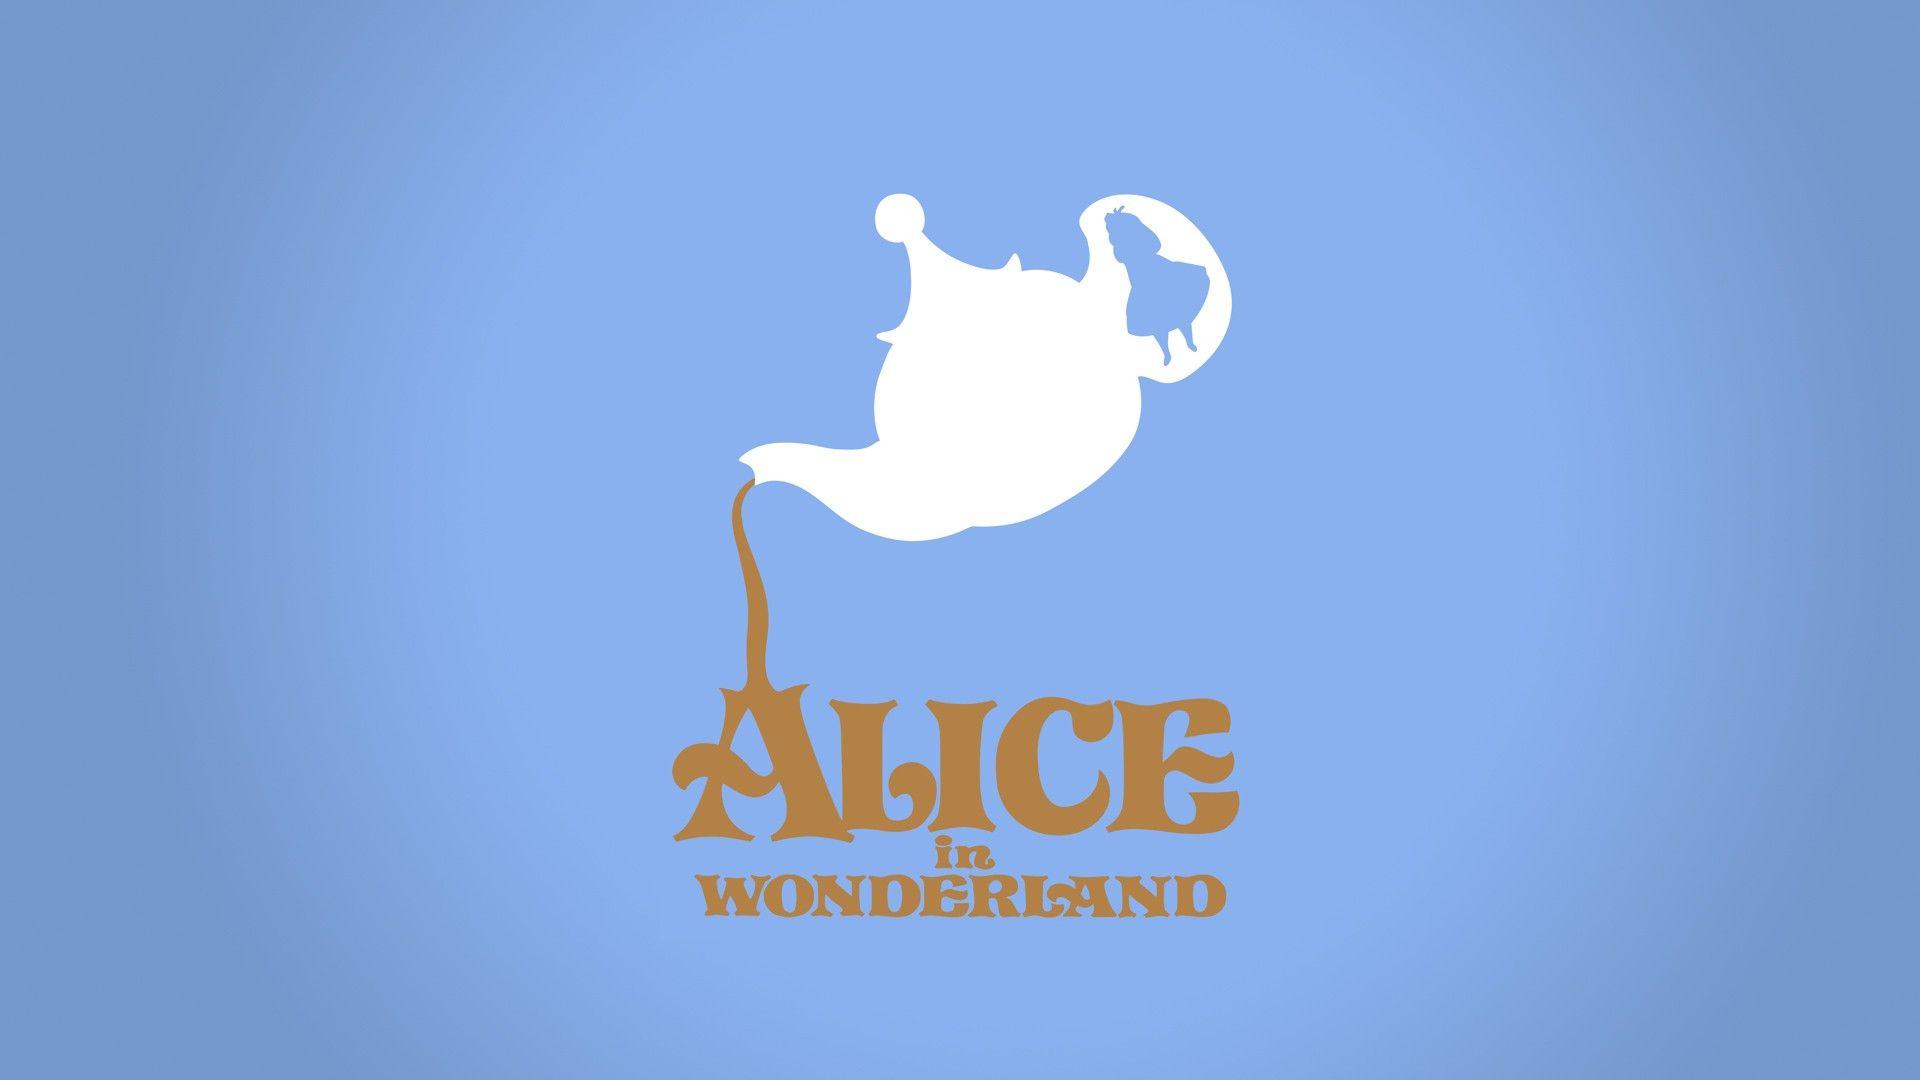 Movie Alice In Wonderland Wallpaper Disney Wallpaper Alice In Wonderland Disney Minimalist